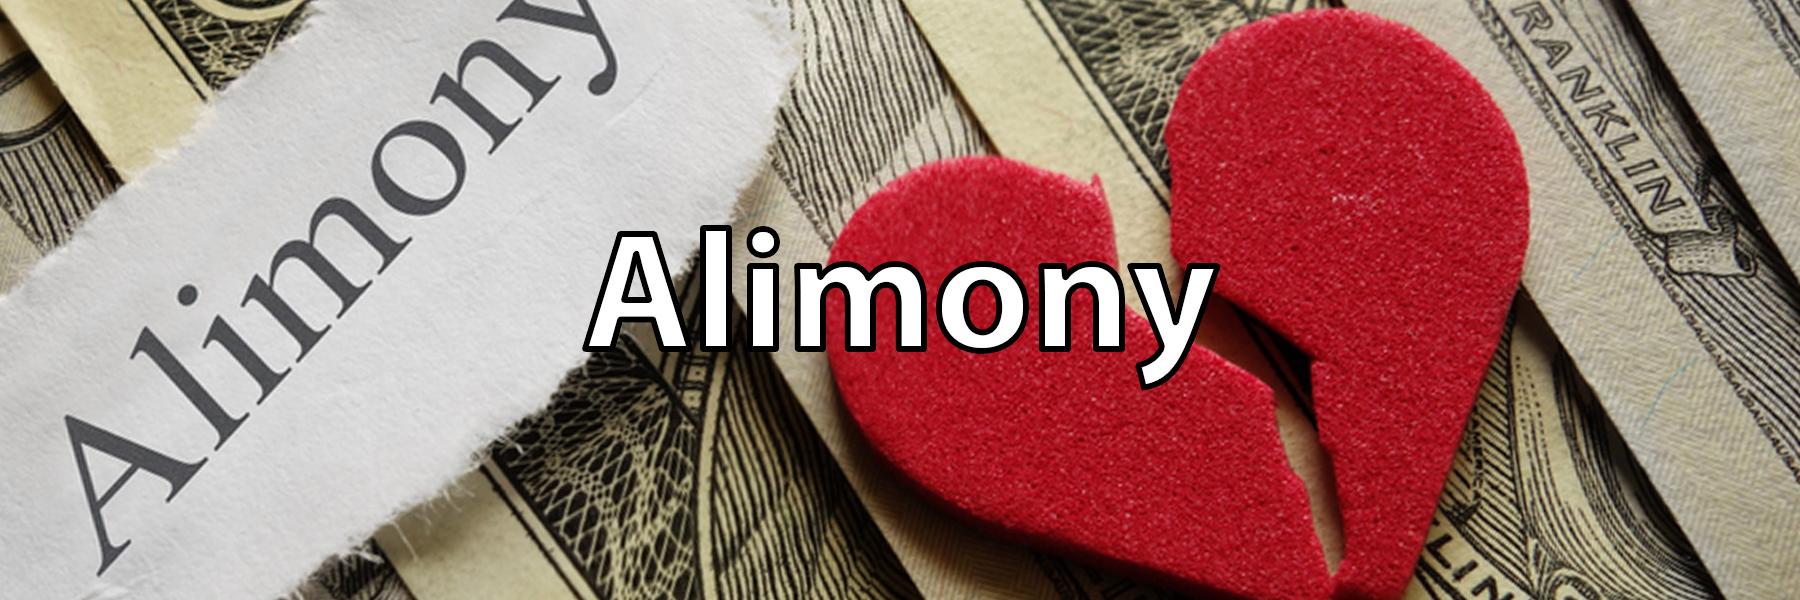 Alimony.jpg